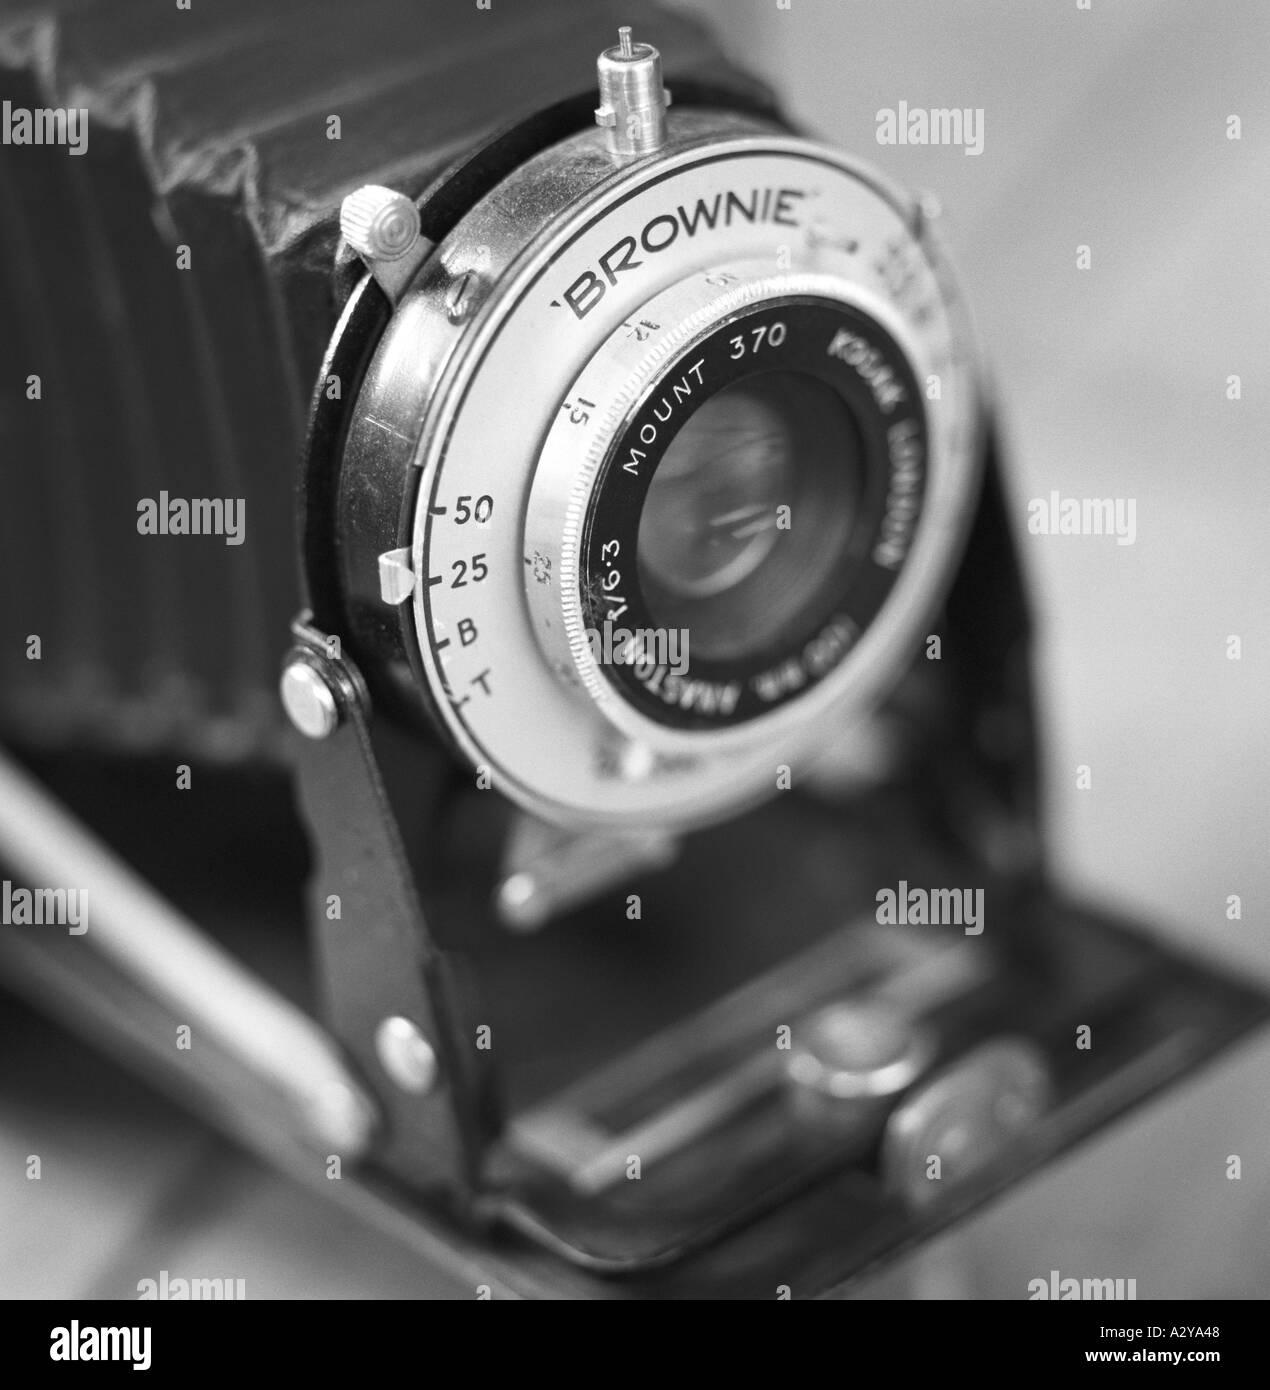 Six 20 Folding Kodak Brownie camera in black and white - Stock Image